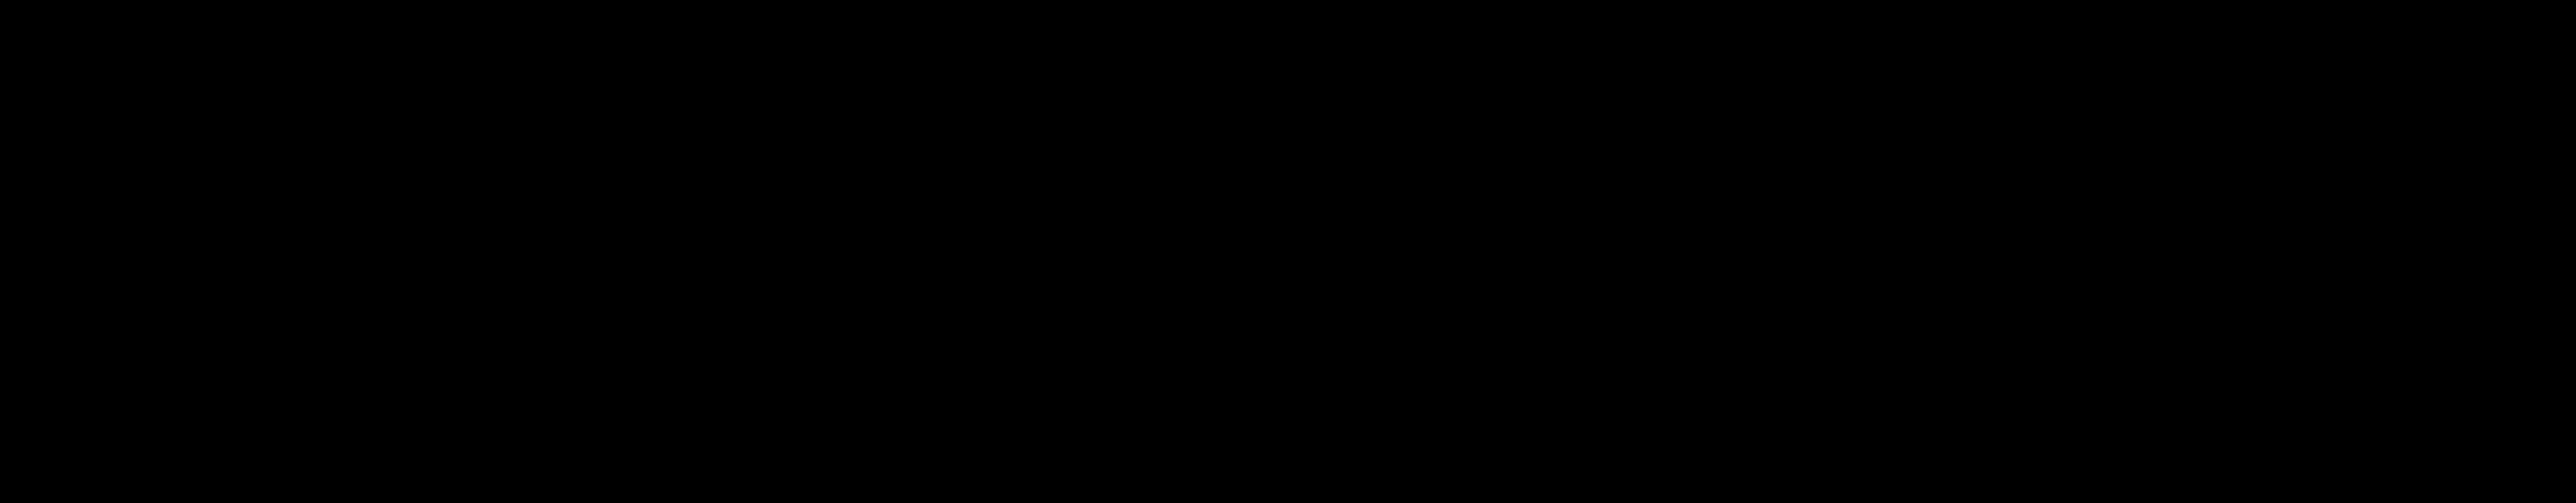 Hot Topic logo